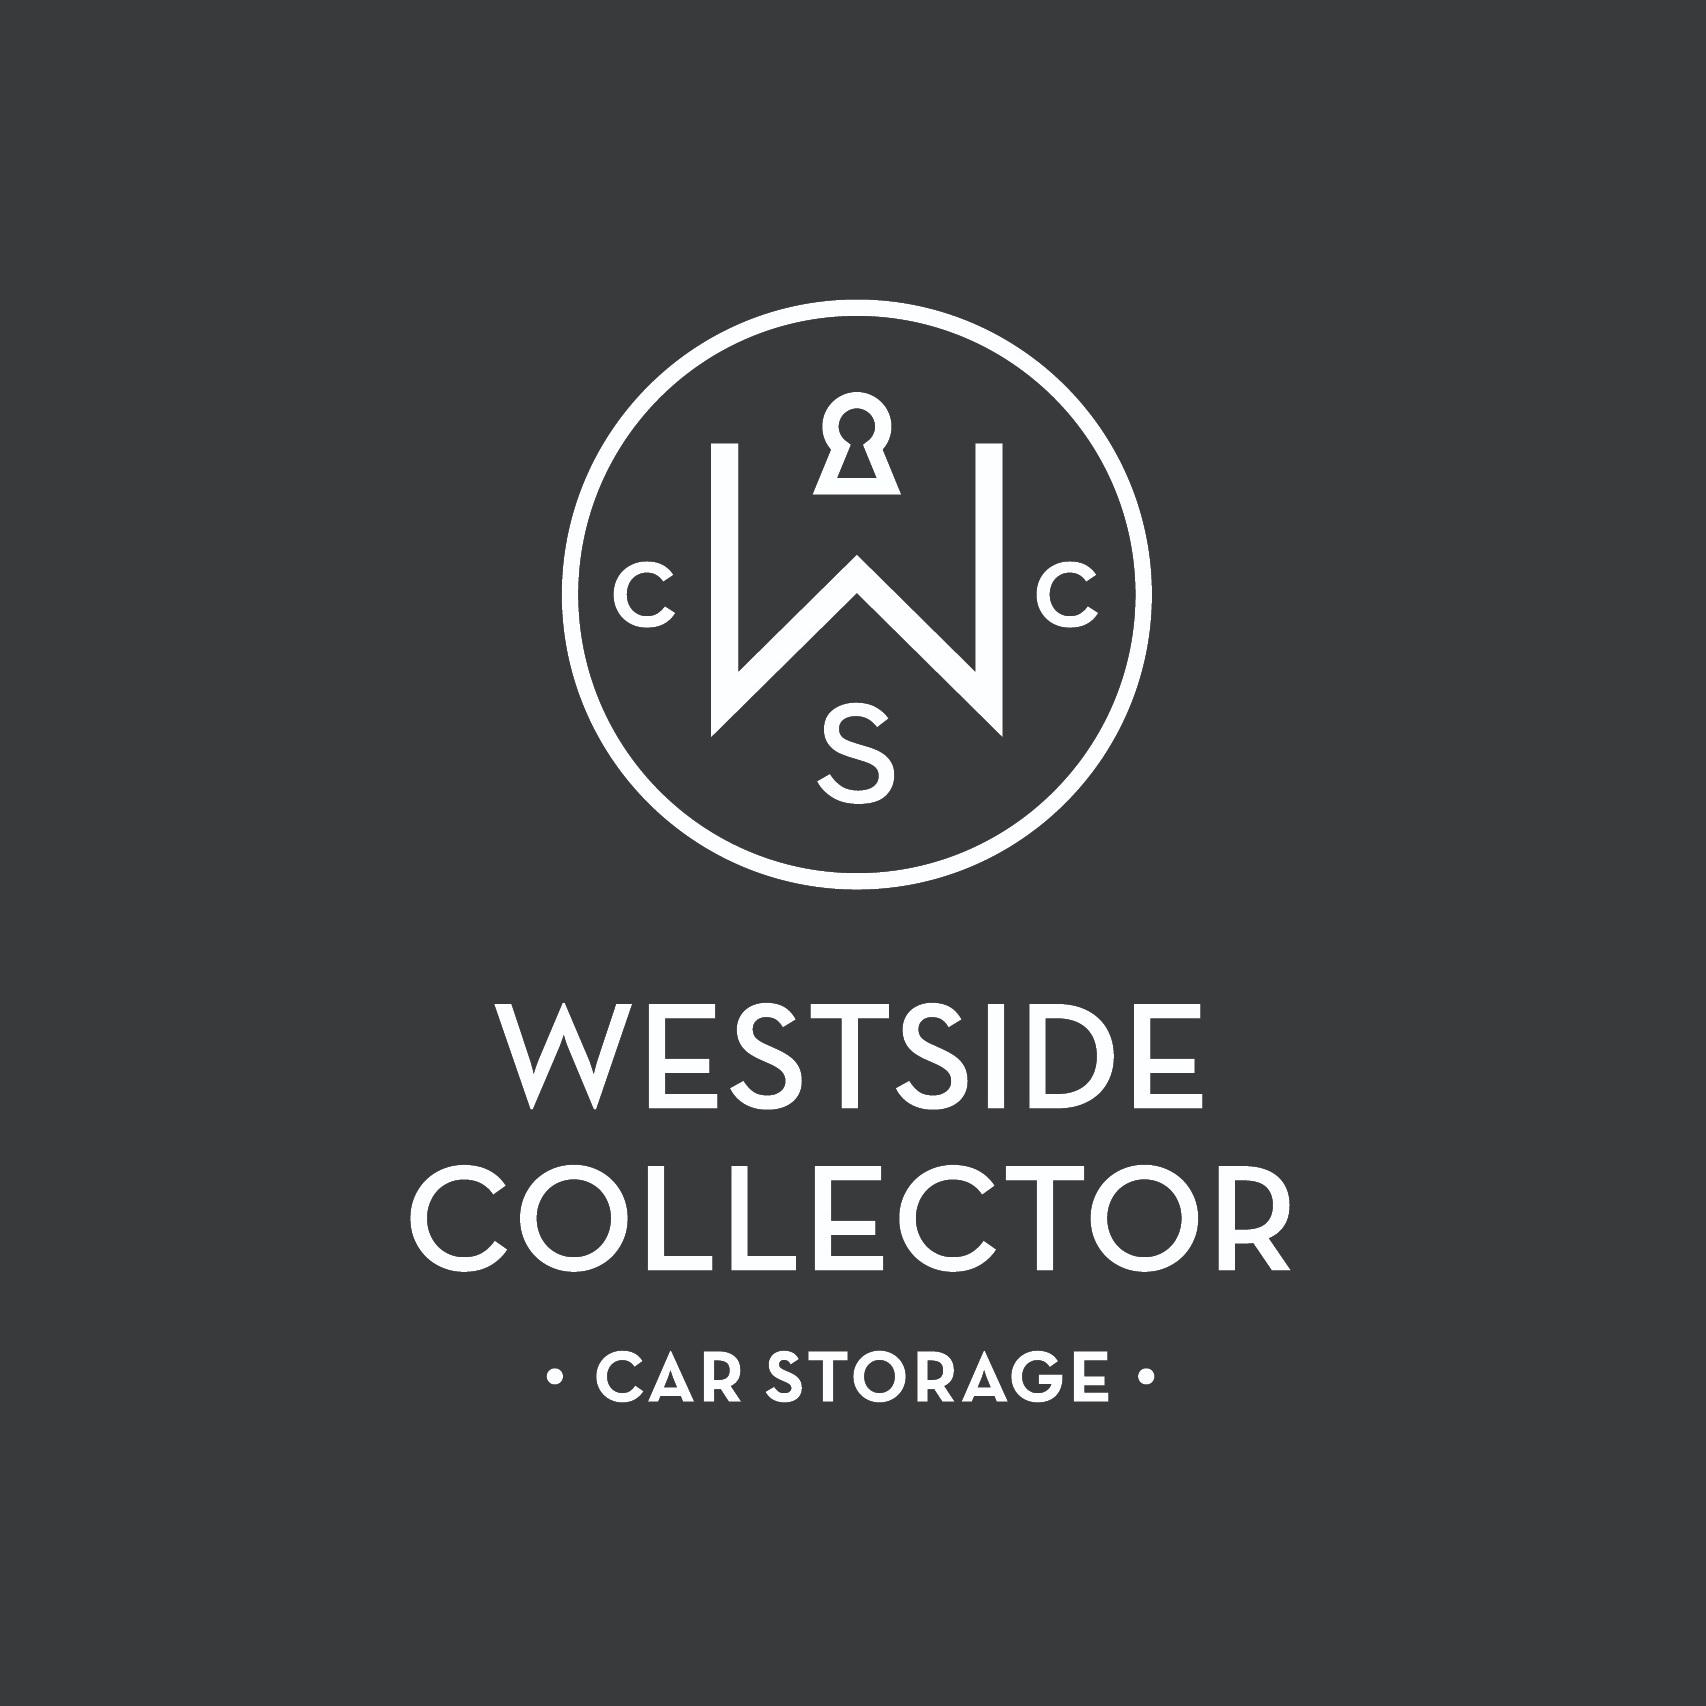 WCCS_Logo-CMYK-white.jpg